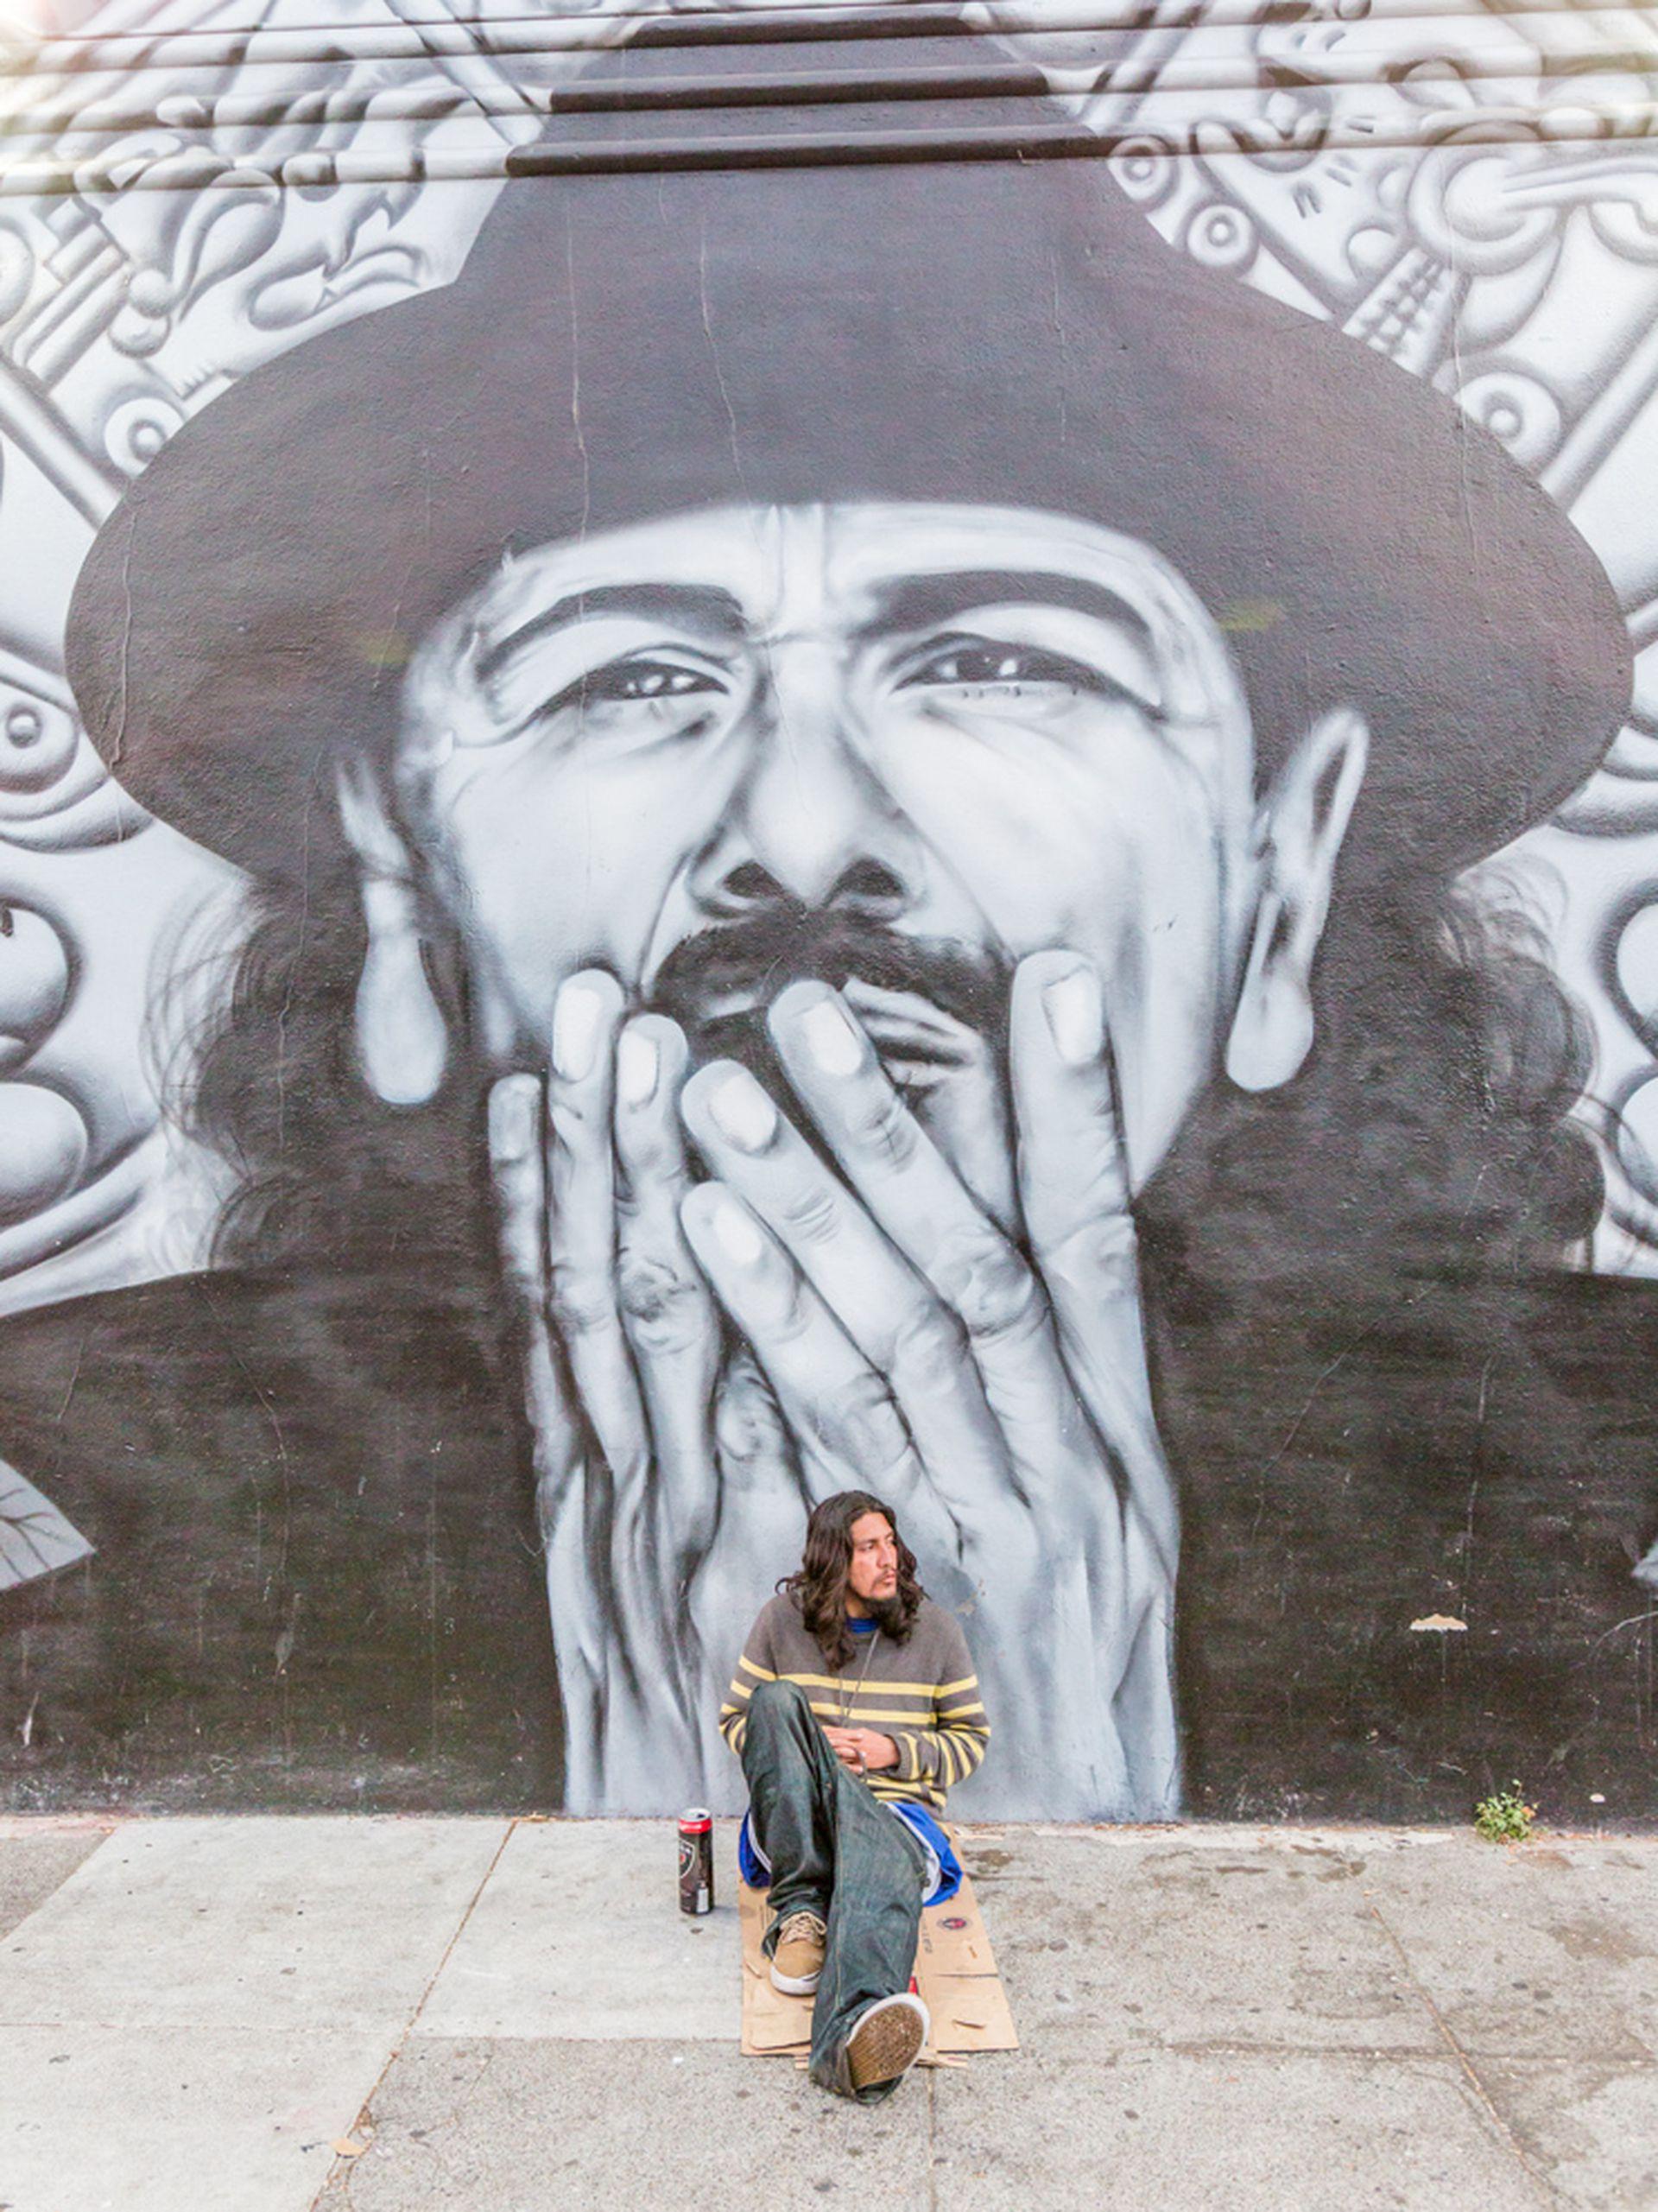 Street art en las calles del barrio The Mission, San Francisco.